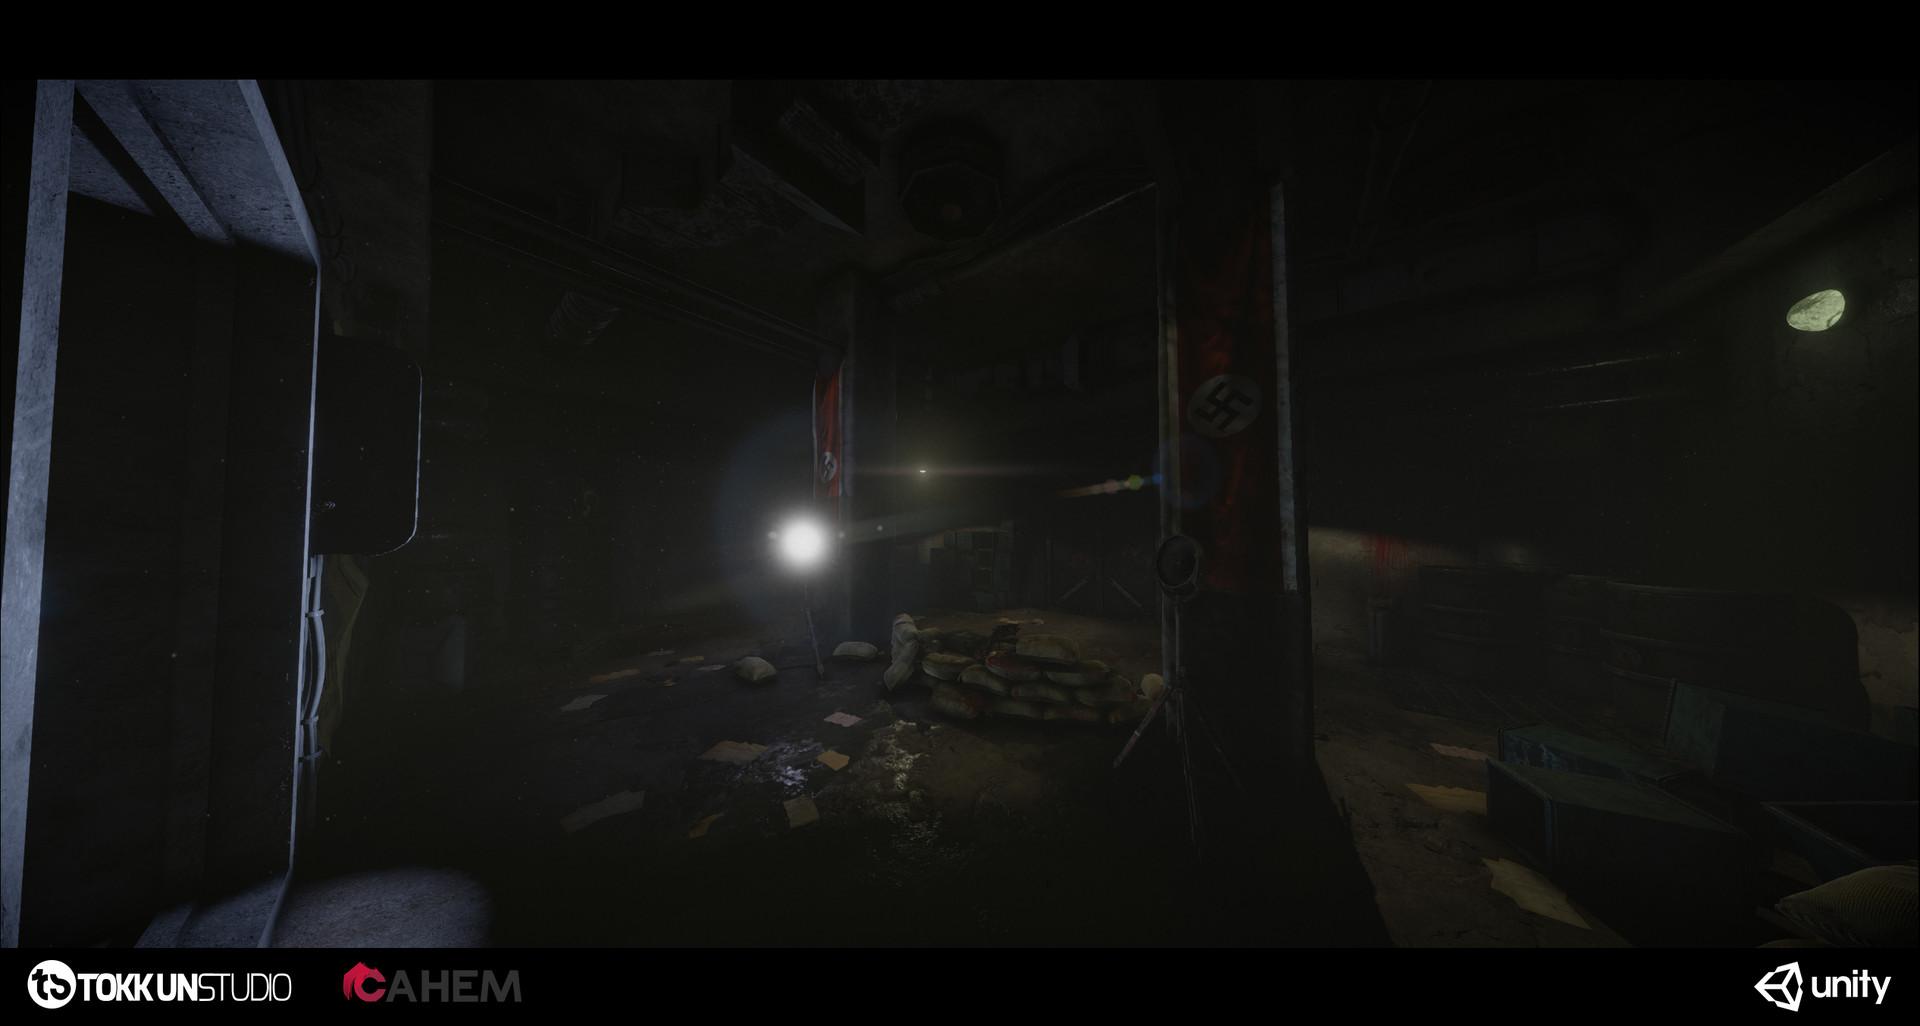 Tokkun studio bunker shot 27